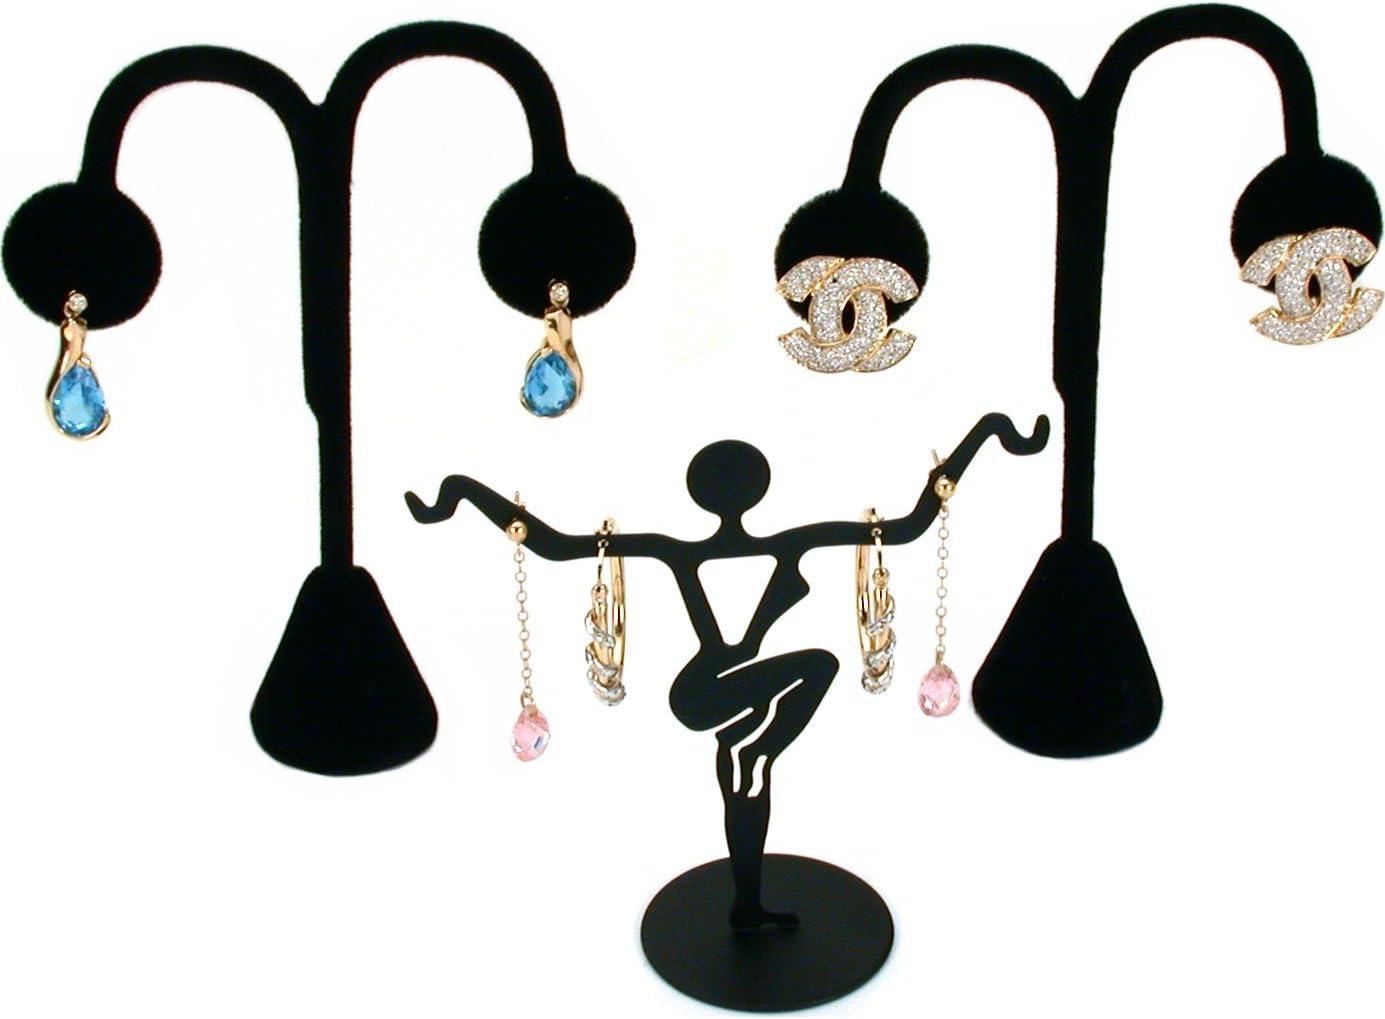 11 Pc Set Black Velvet Jewelry Displays Busts Bonus New